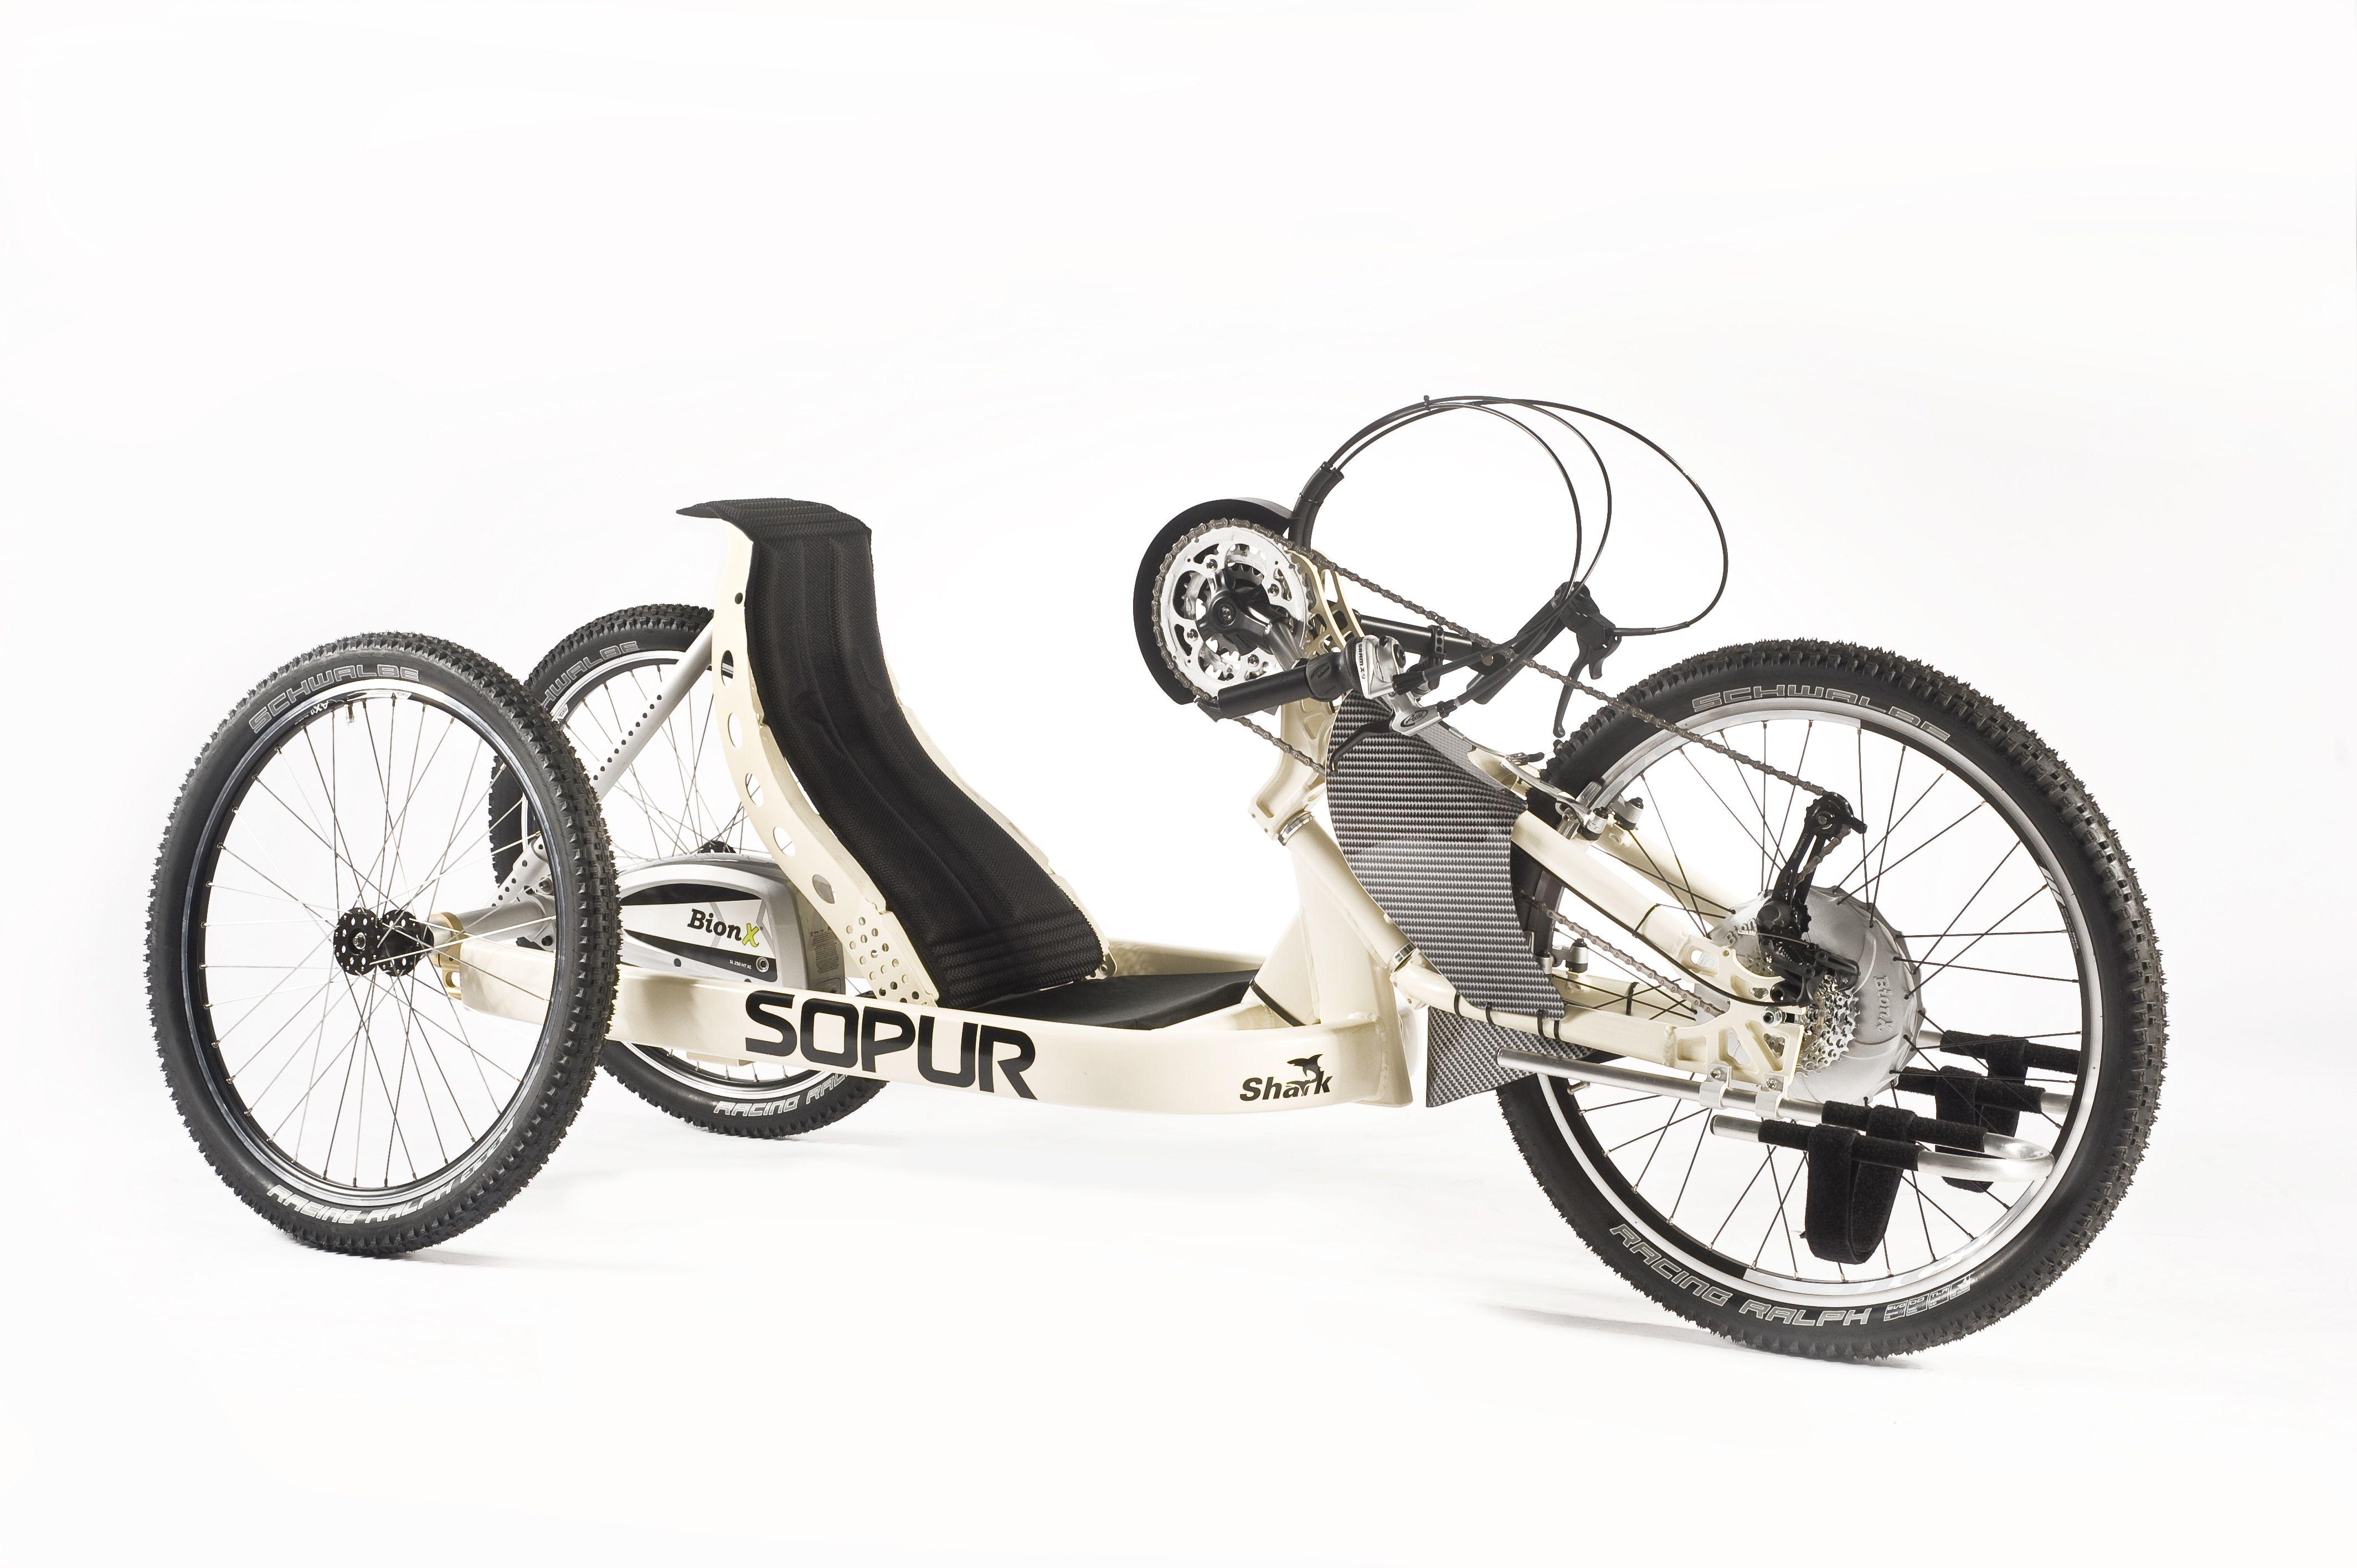 sopur shark offroad sonderbau mit mountainbike bereifung. Black Bedroom Furniture Sets. Home Design Ideas